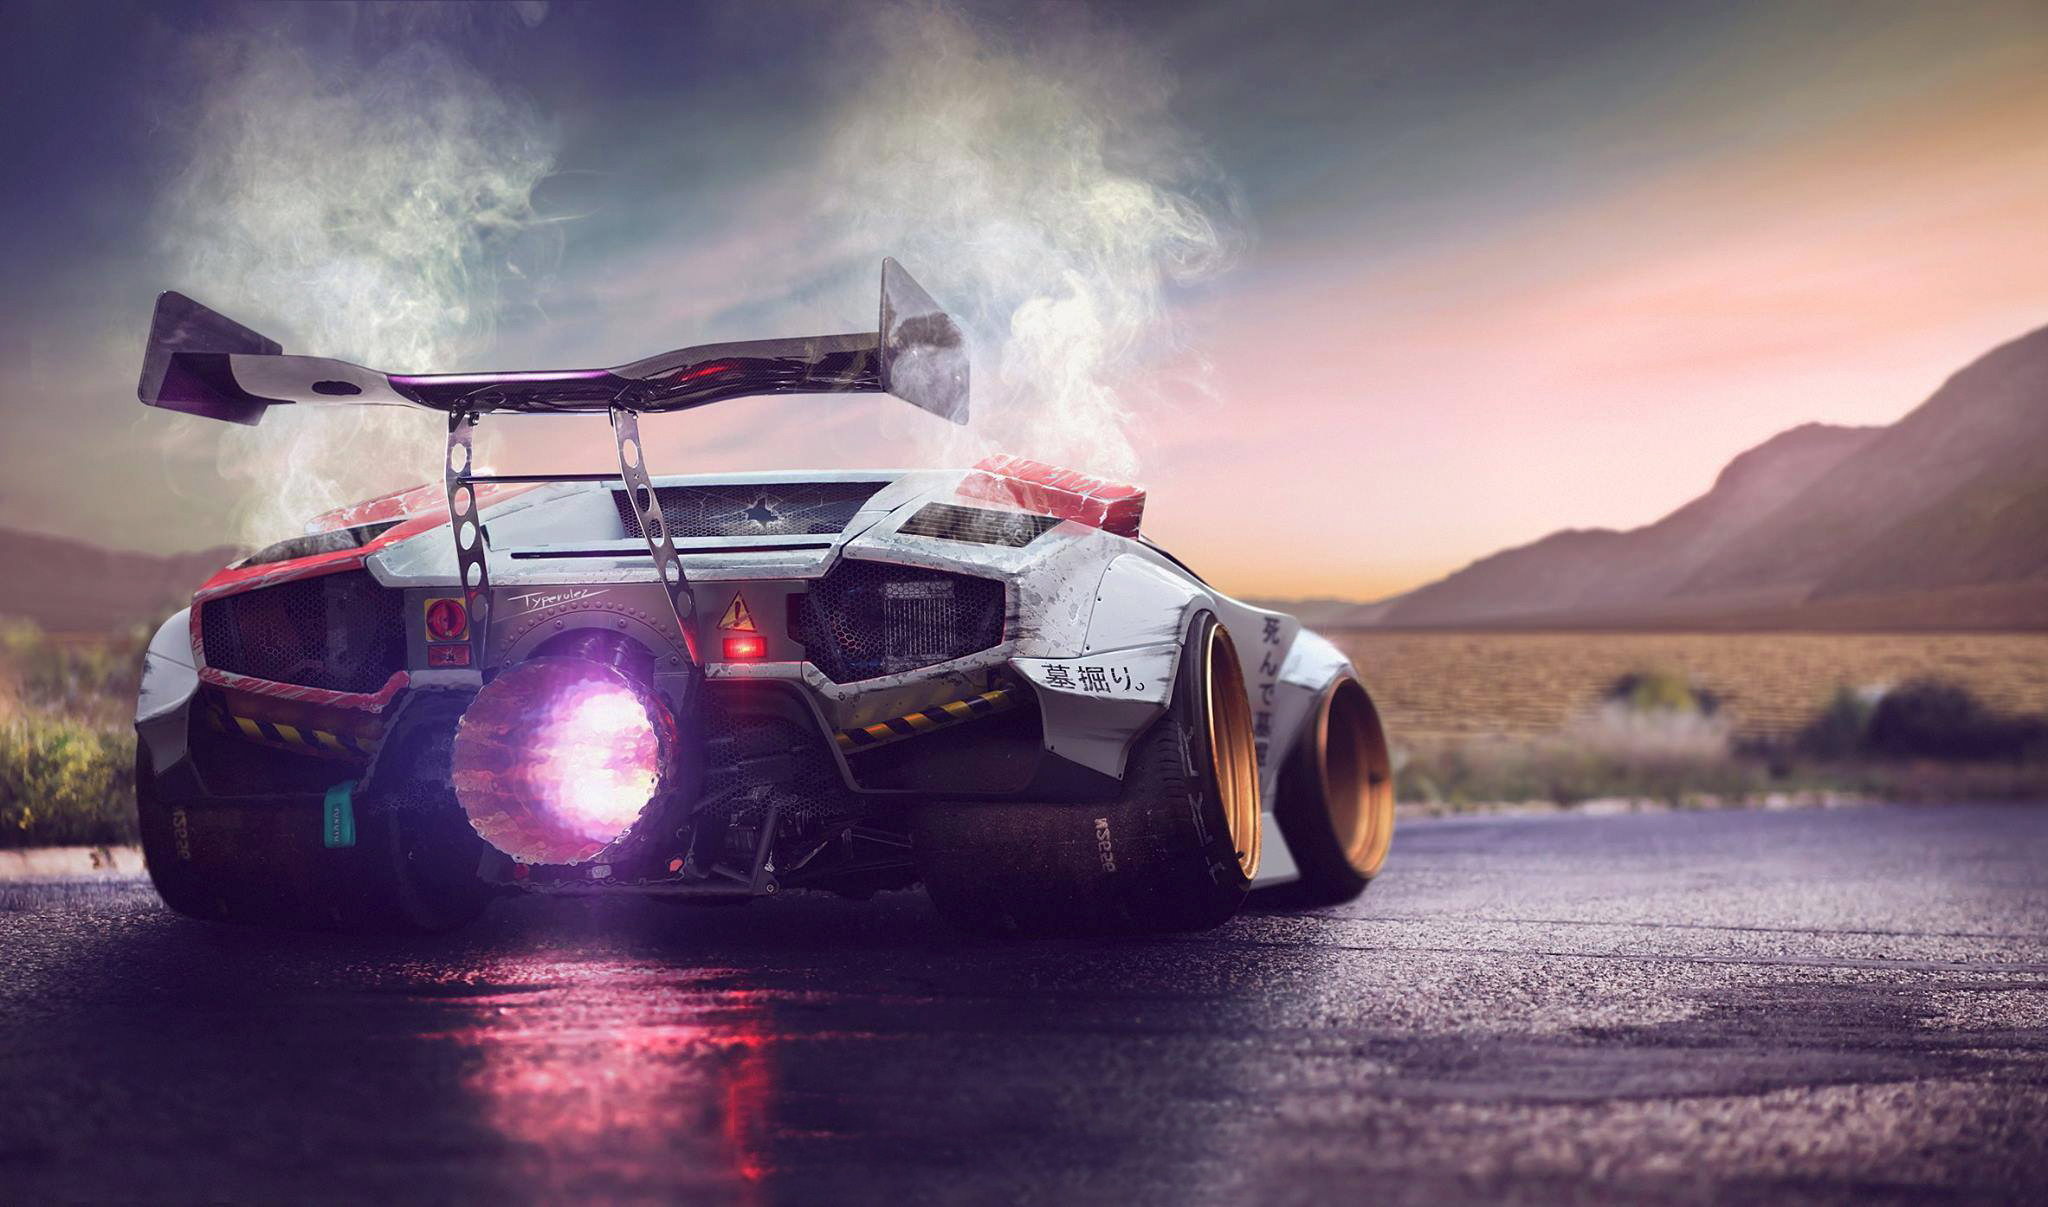 12 Lamborghini Countach Hd Wallpapers Backgrounds